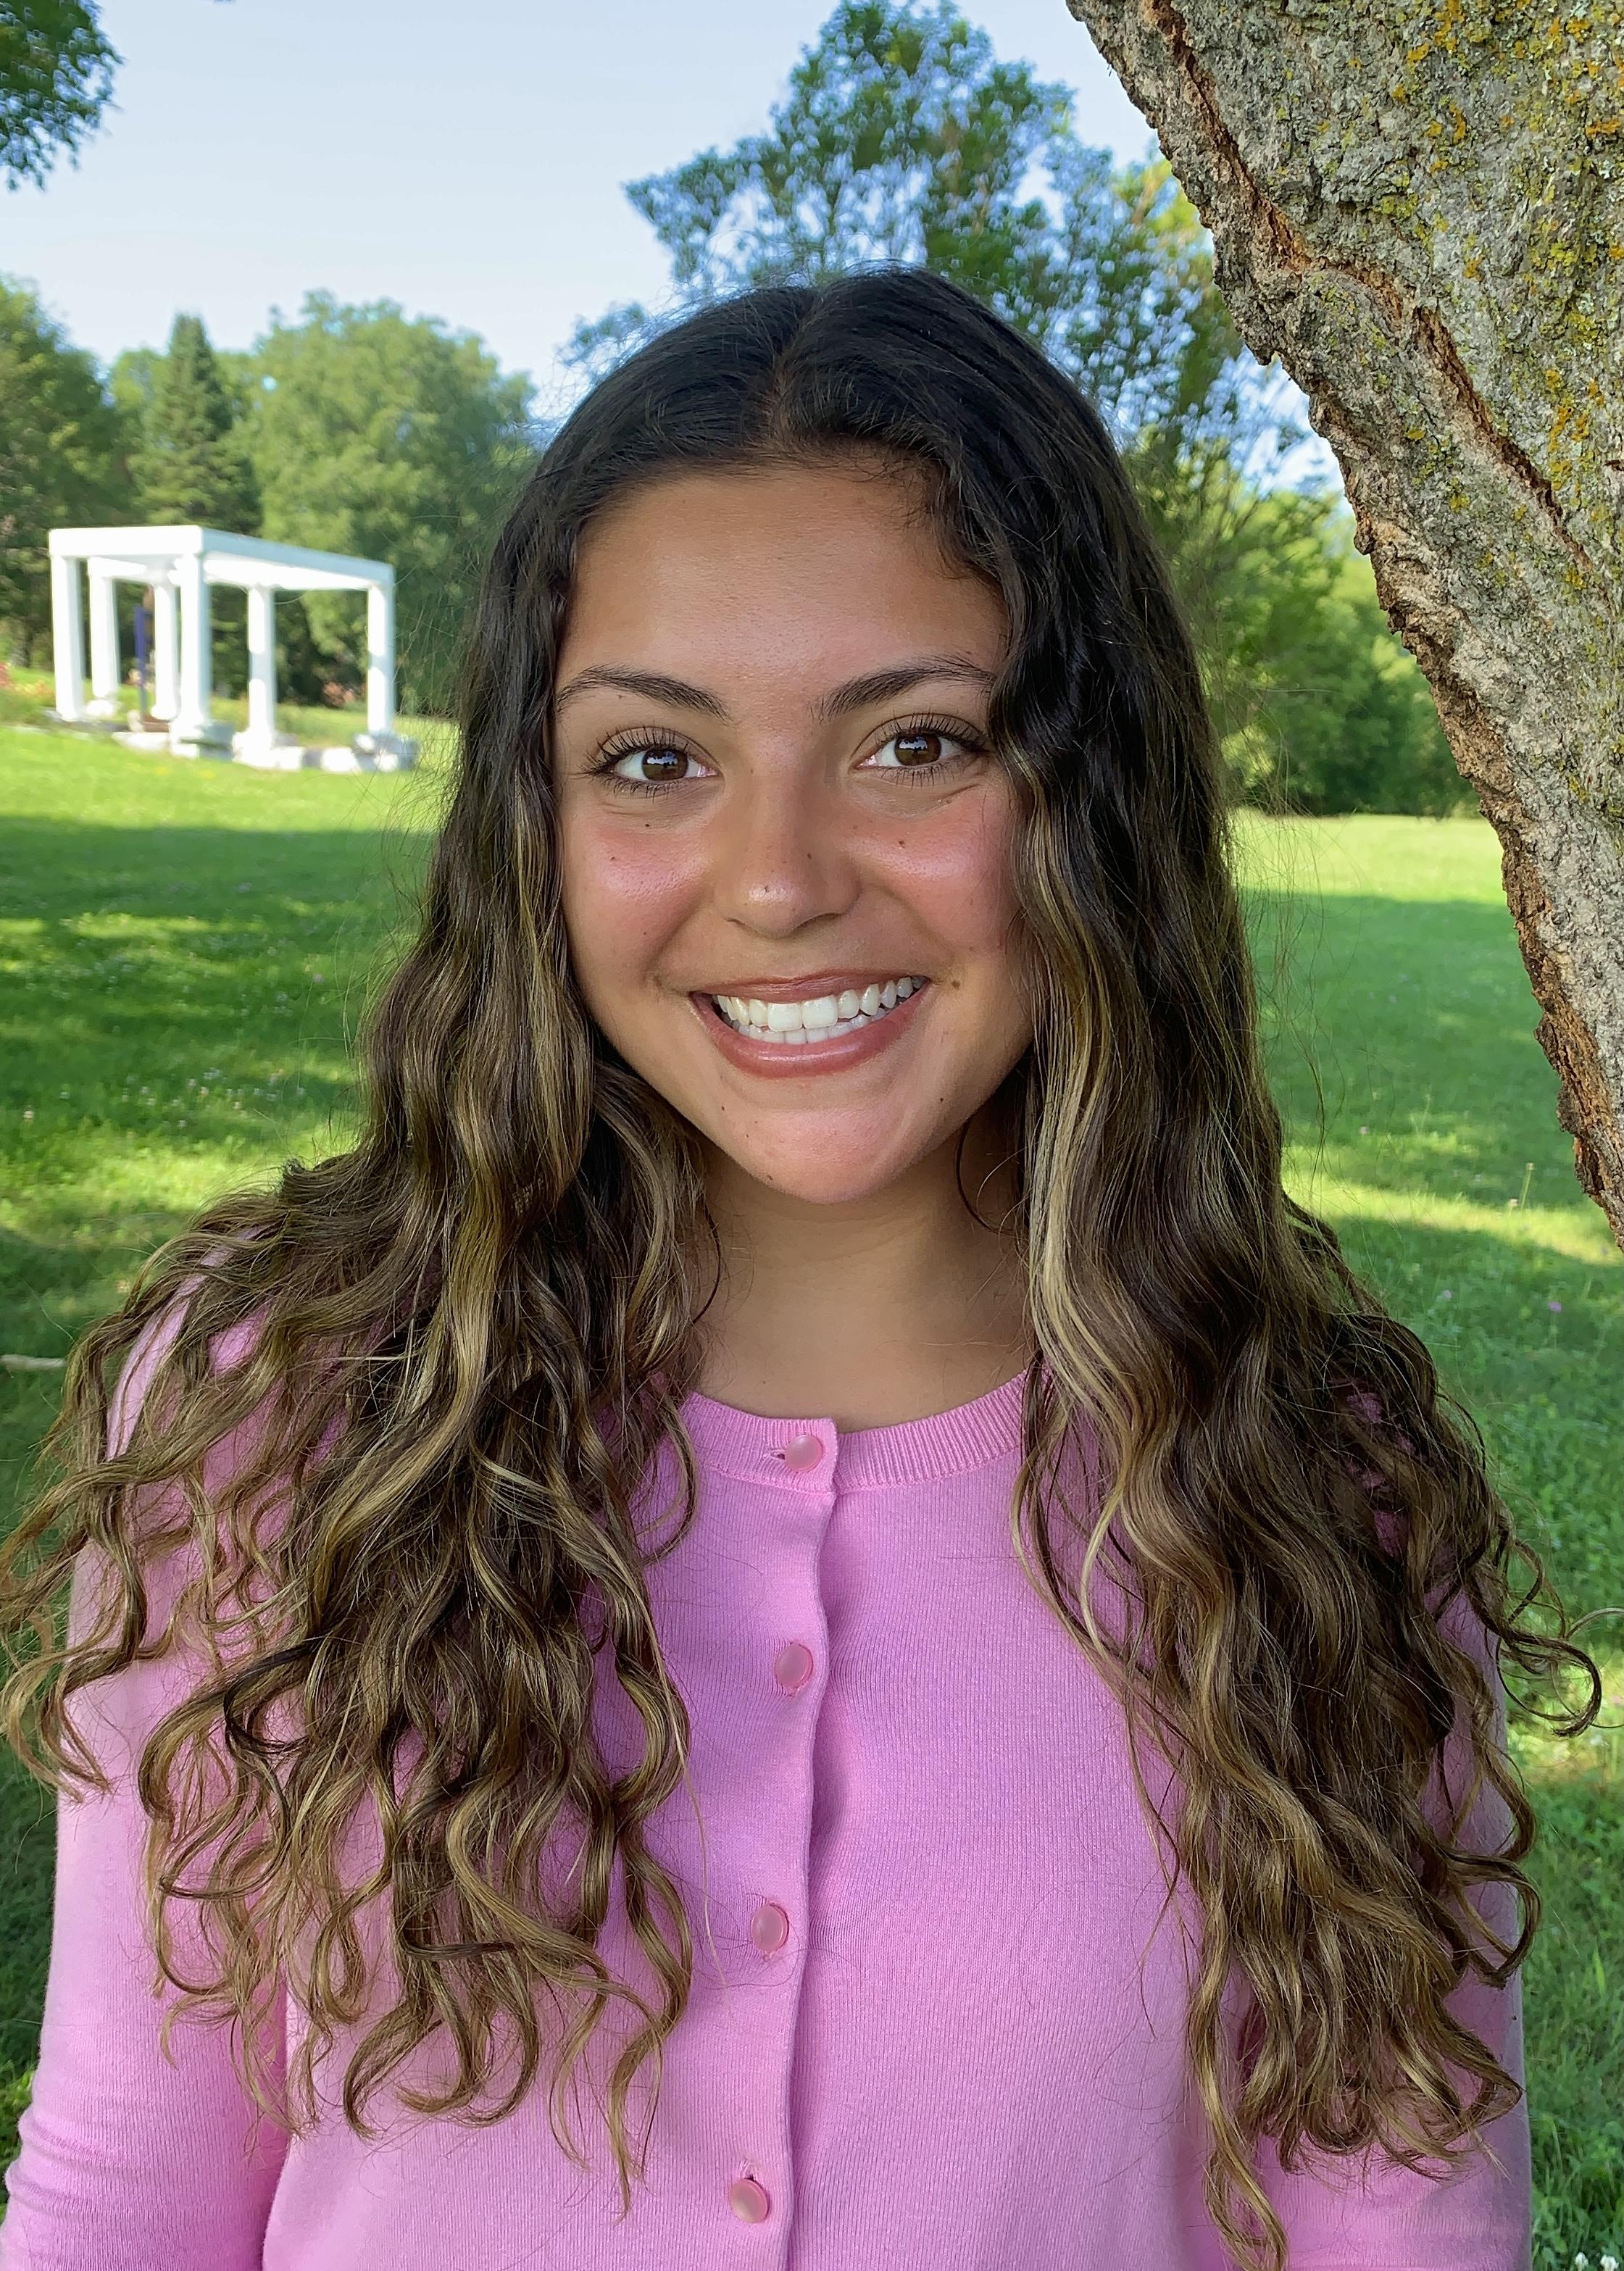 Jasmine Jenkinson as enjoyed a whirlwind summer